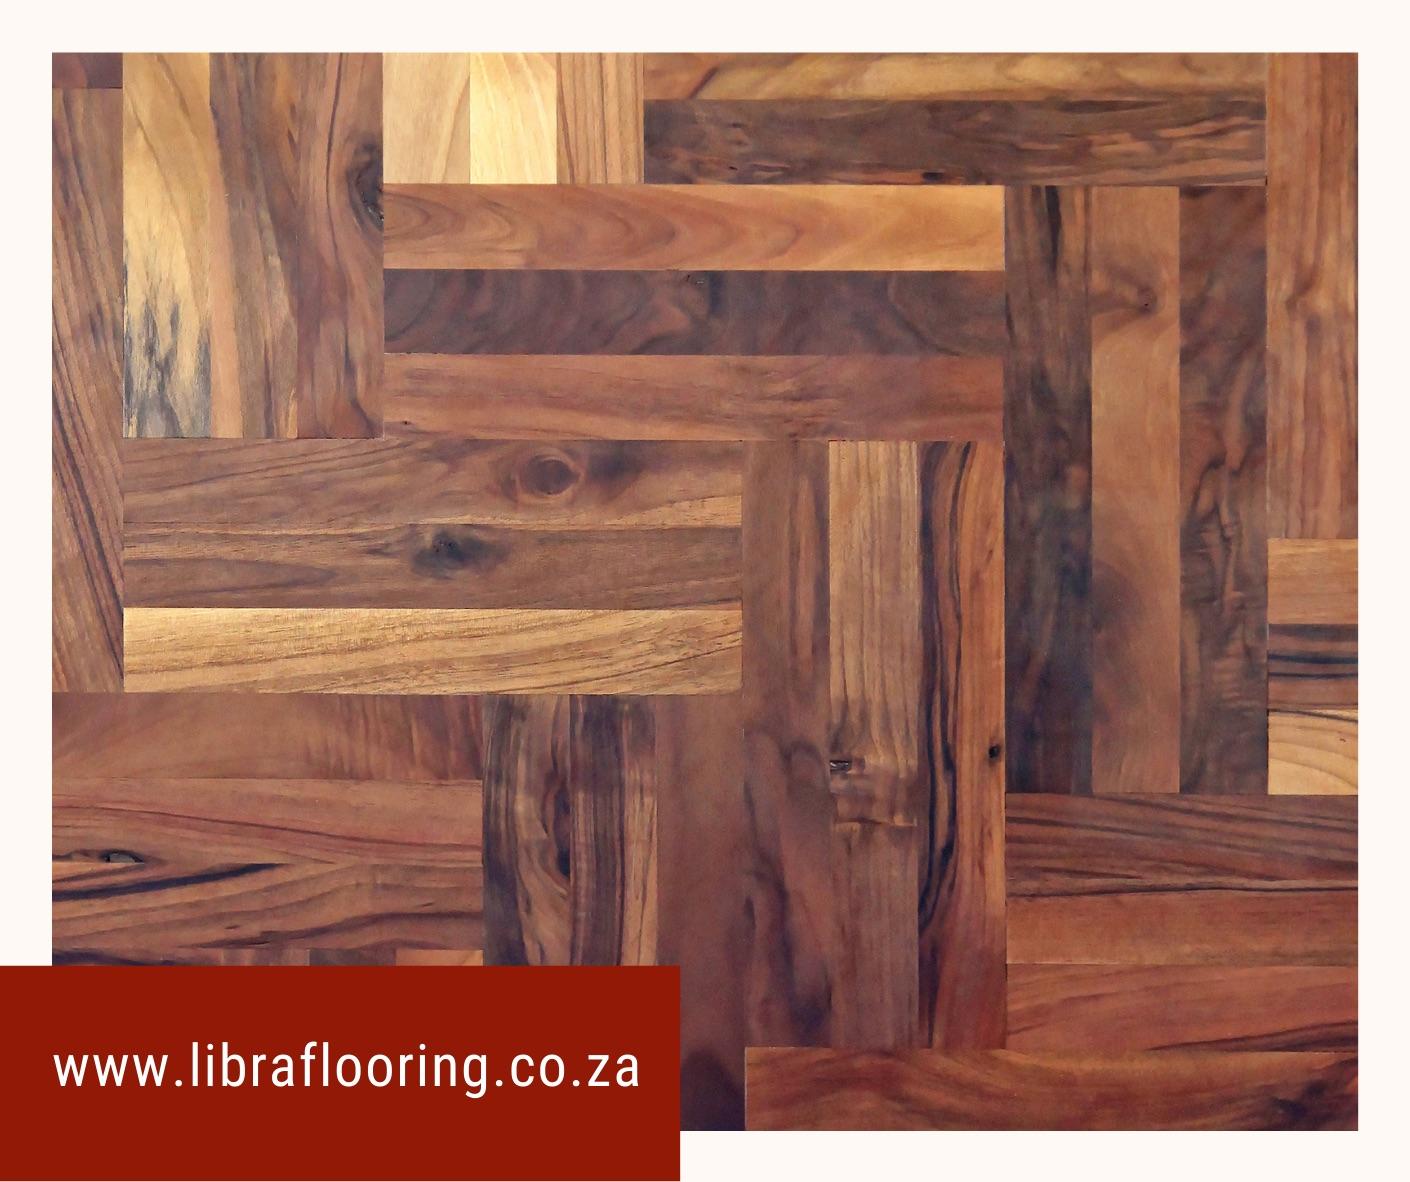 parquet-flooring-montague-gardens-libra-flooring